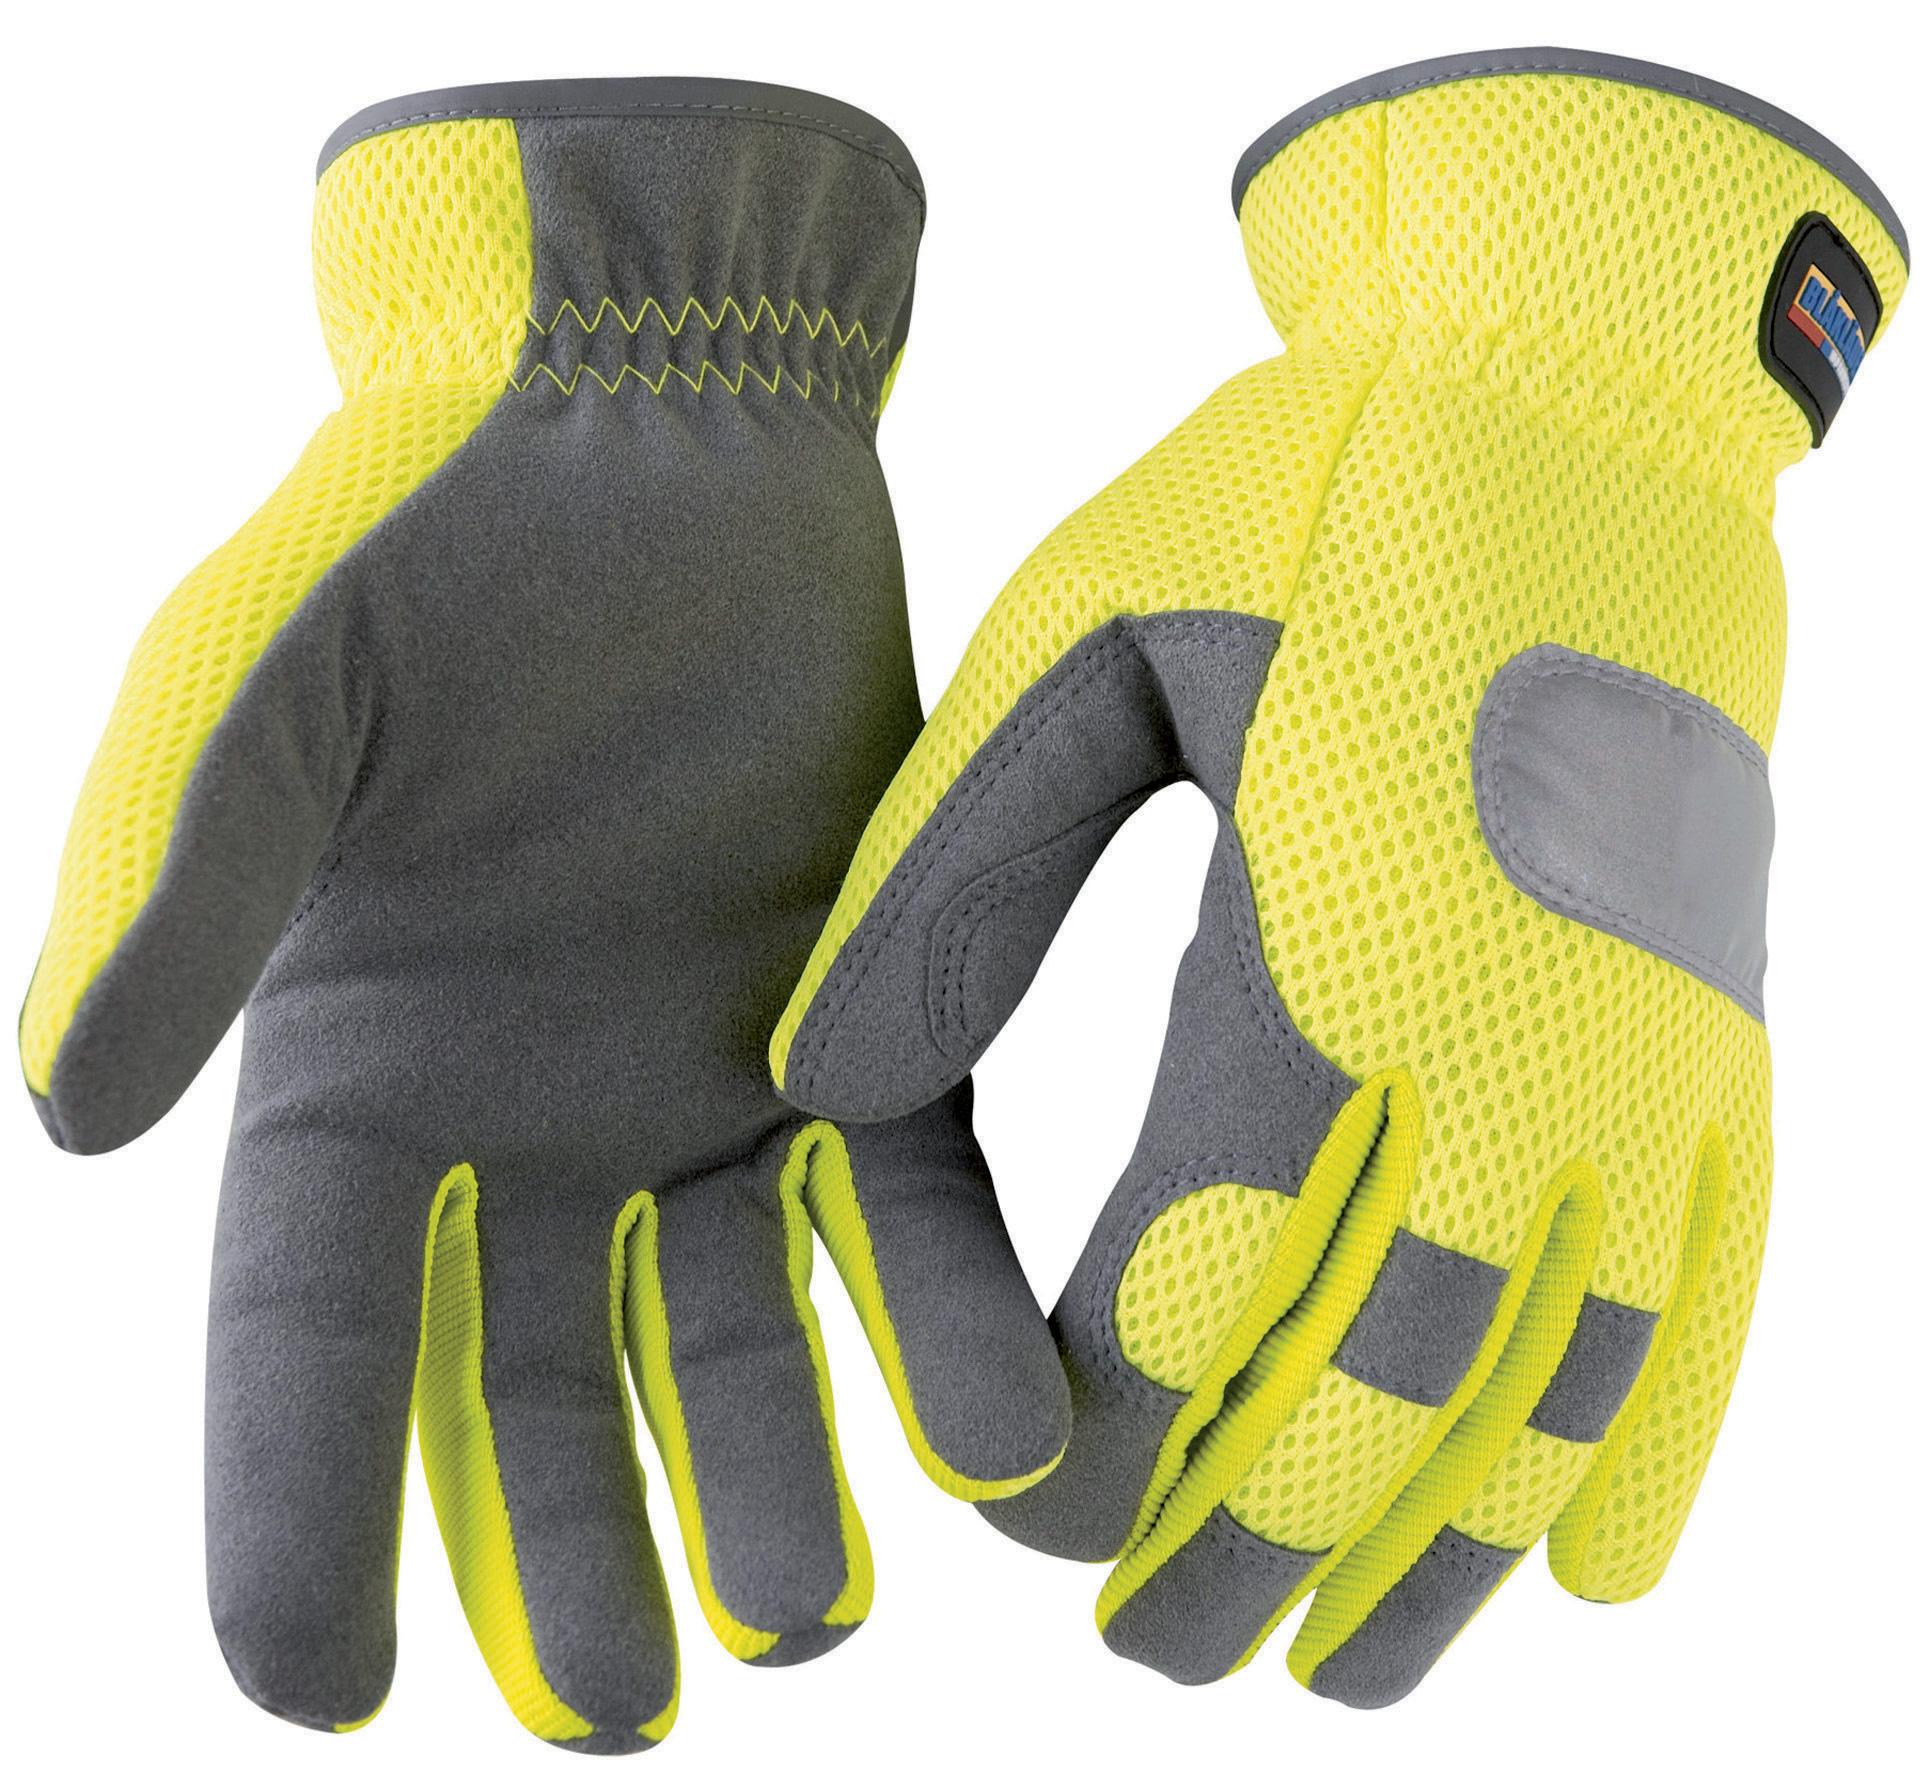 gants haute visibilit jaune gris gants de protection v tements et epi distriartisan. Black Bedroom Furniture Sets. Home Design Ideas